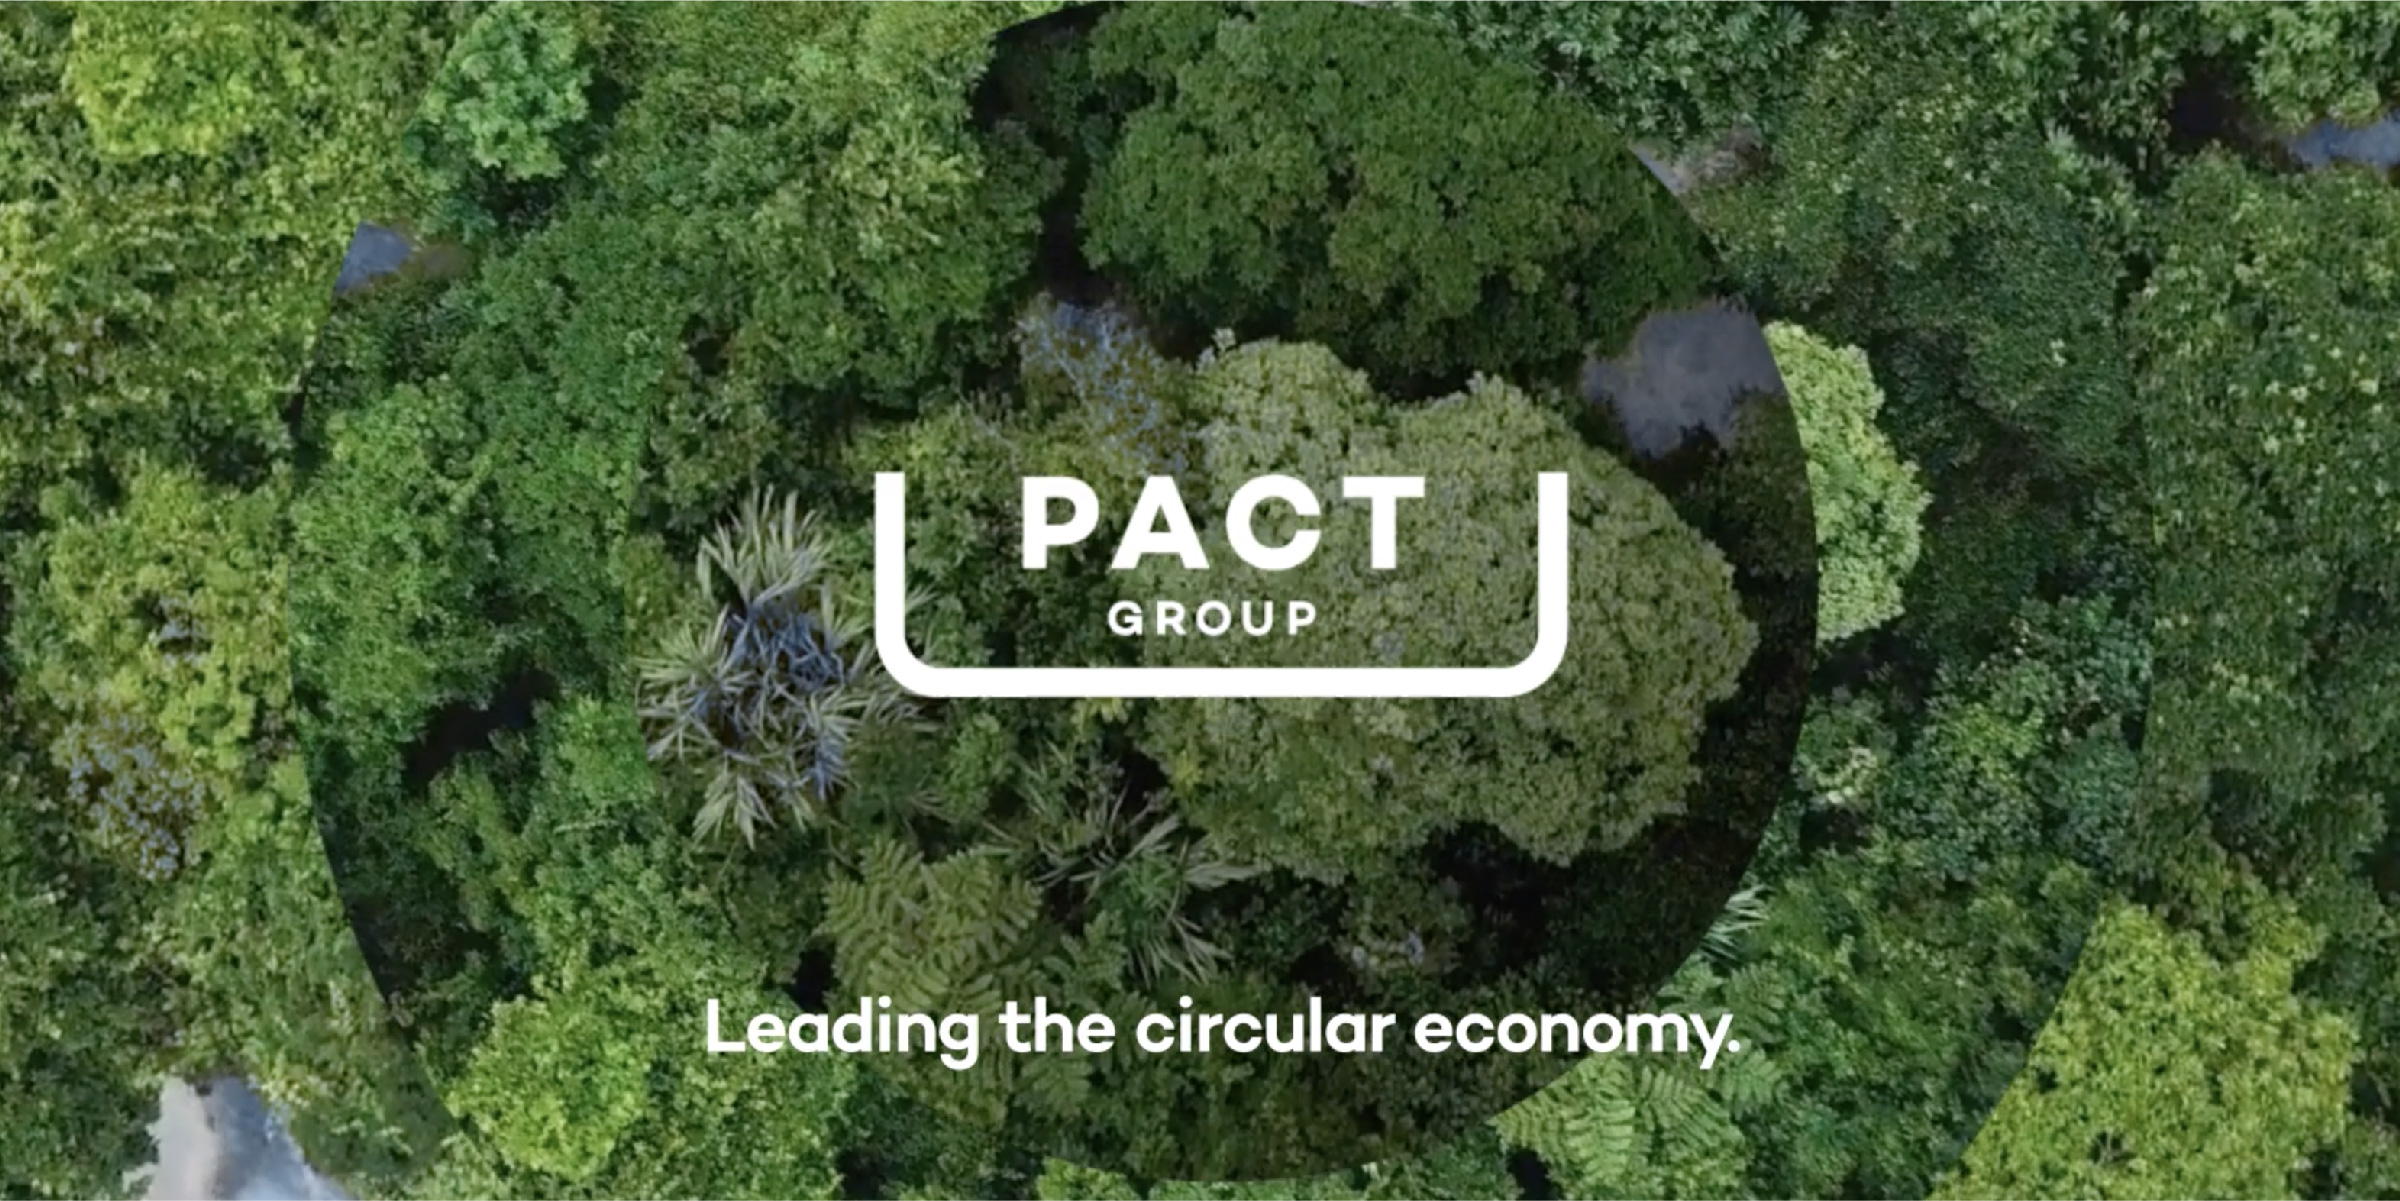 Pact Group Brand Identity Design Corporate Brand Video